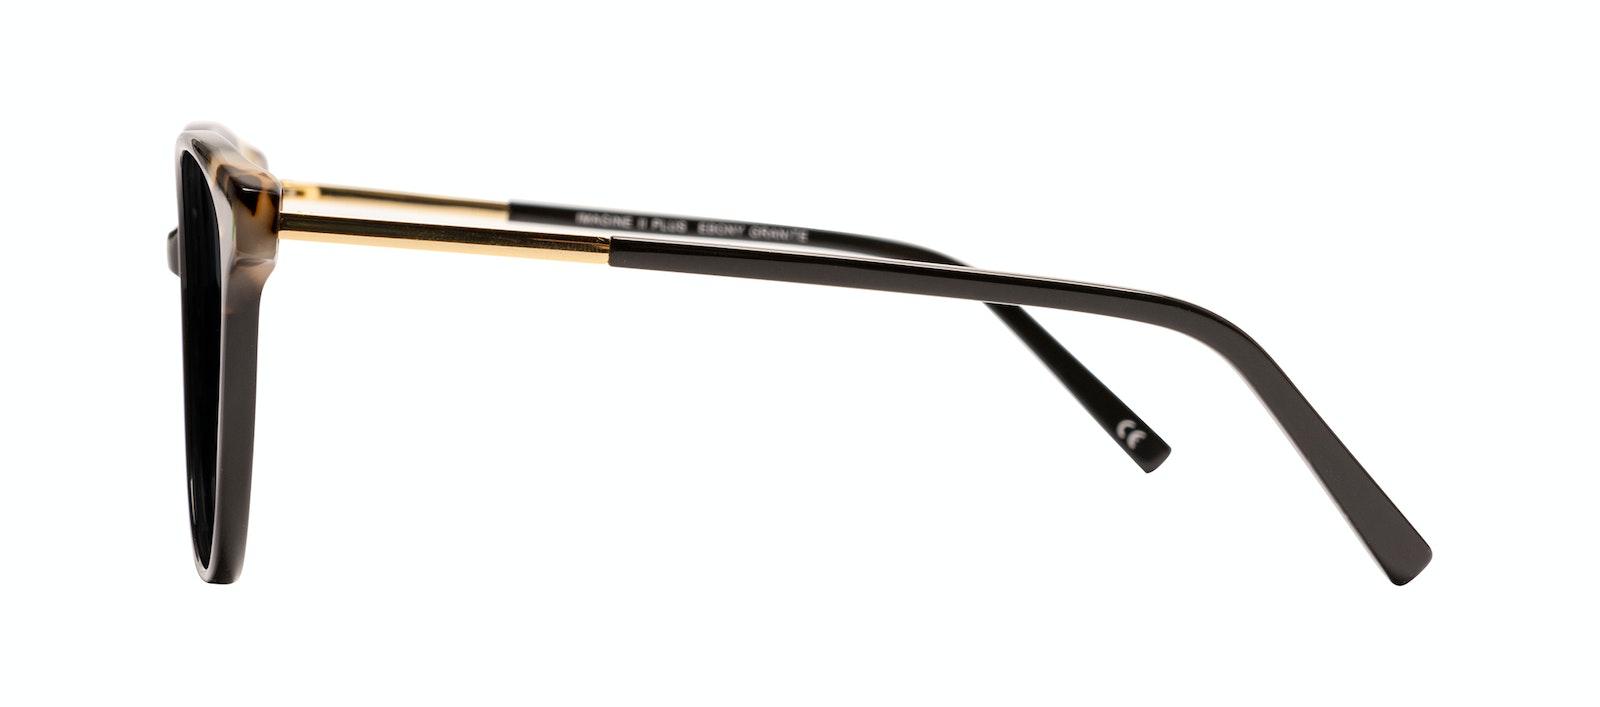 Affordable Fashion Glasses Round Sunglasses Women Imagine II Plus Ebony Granite Side